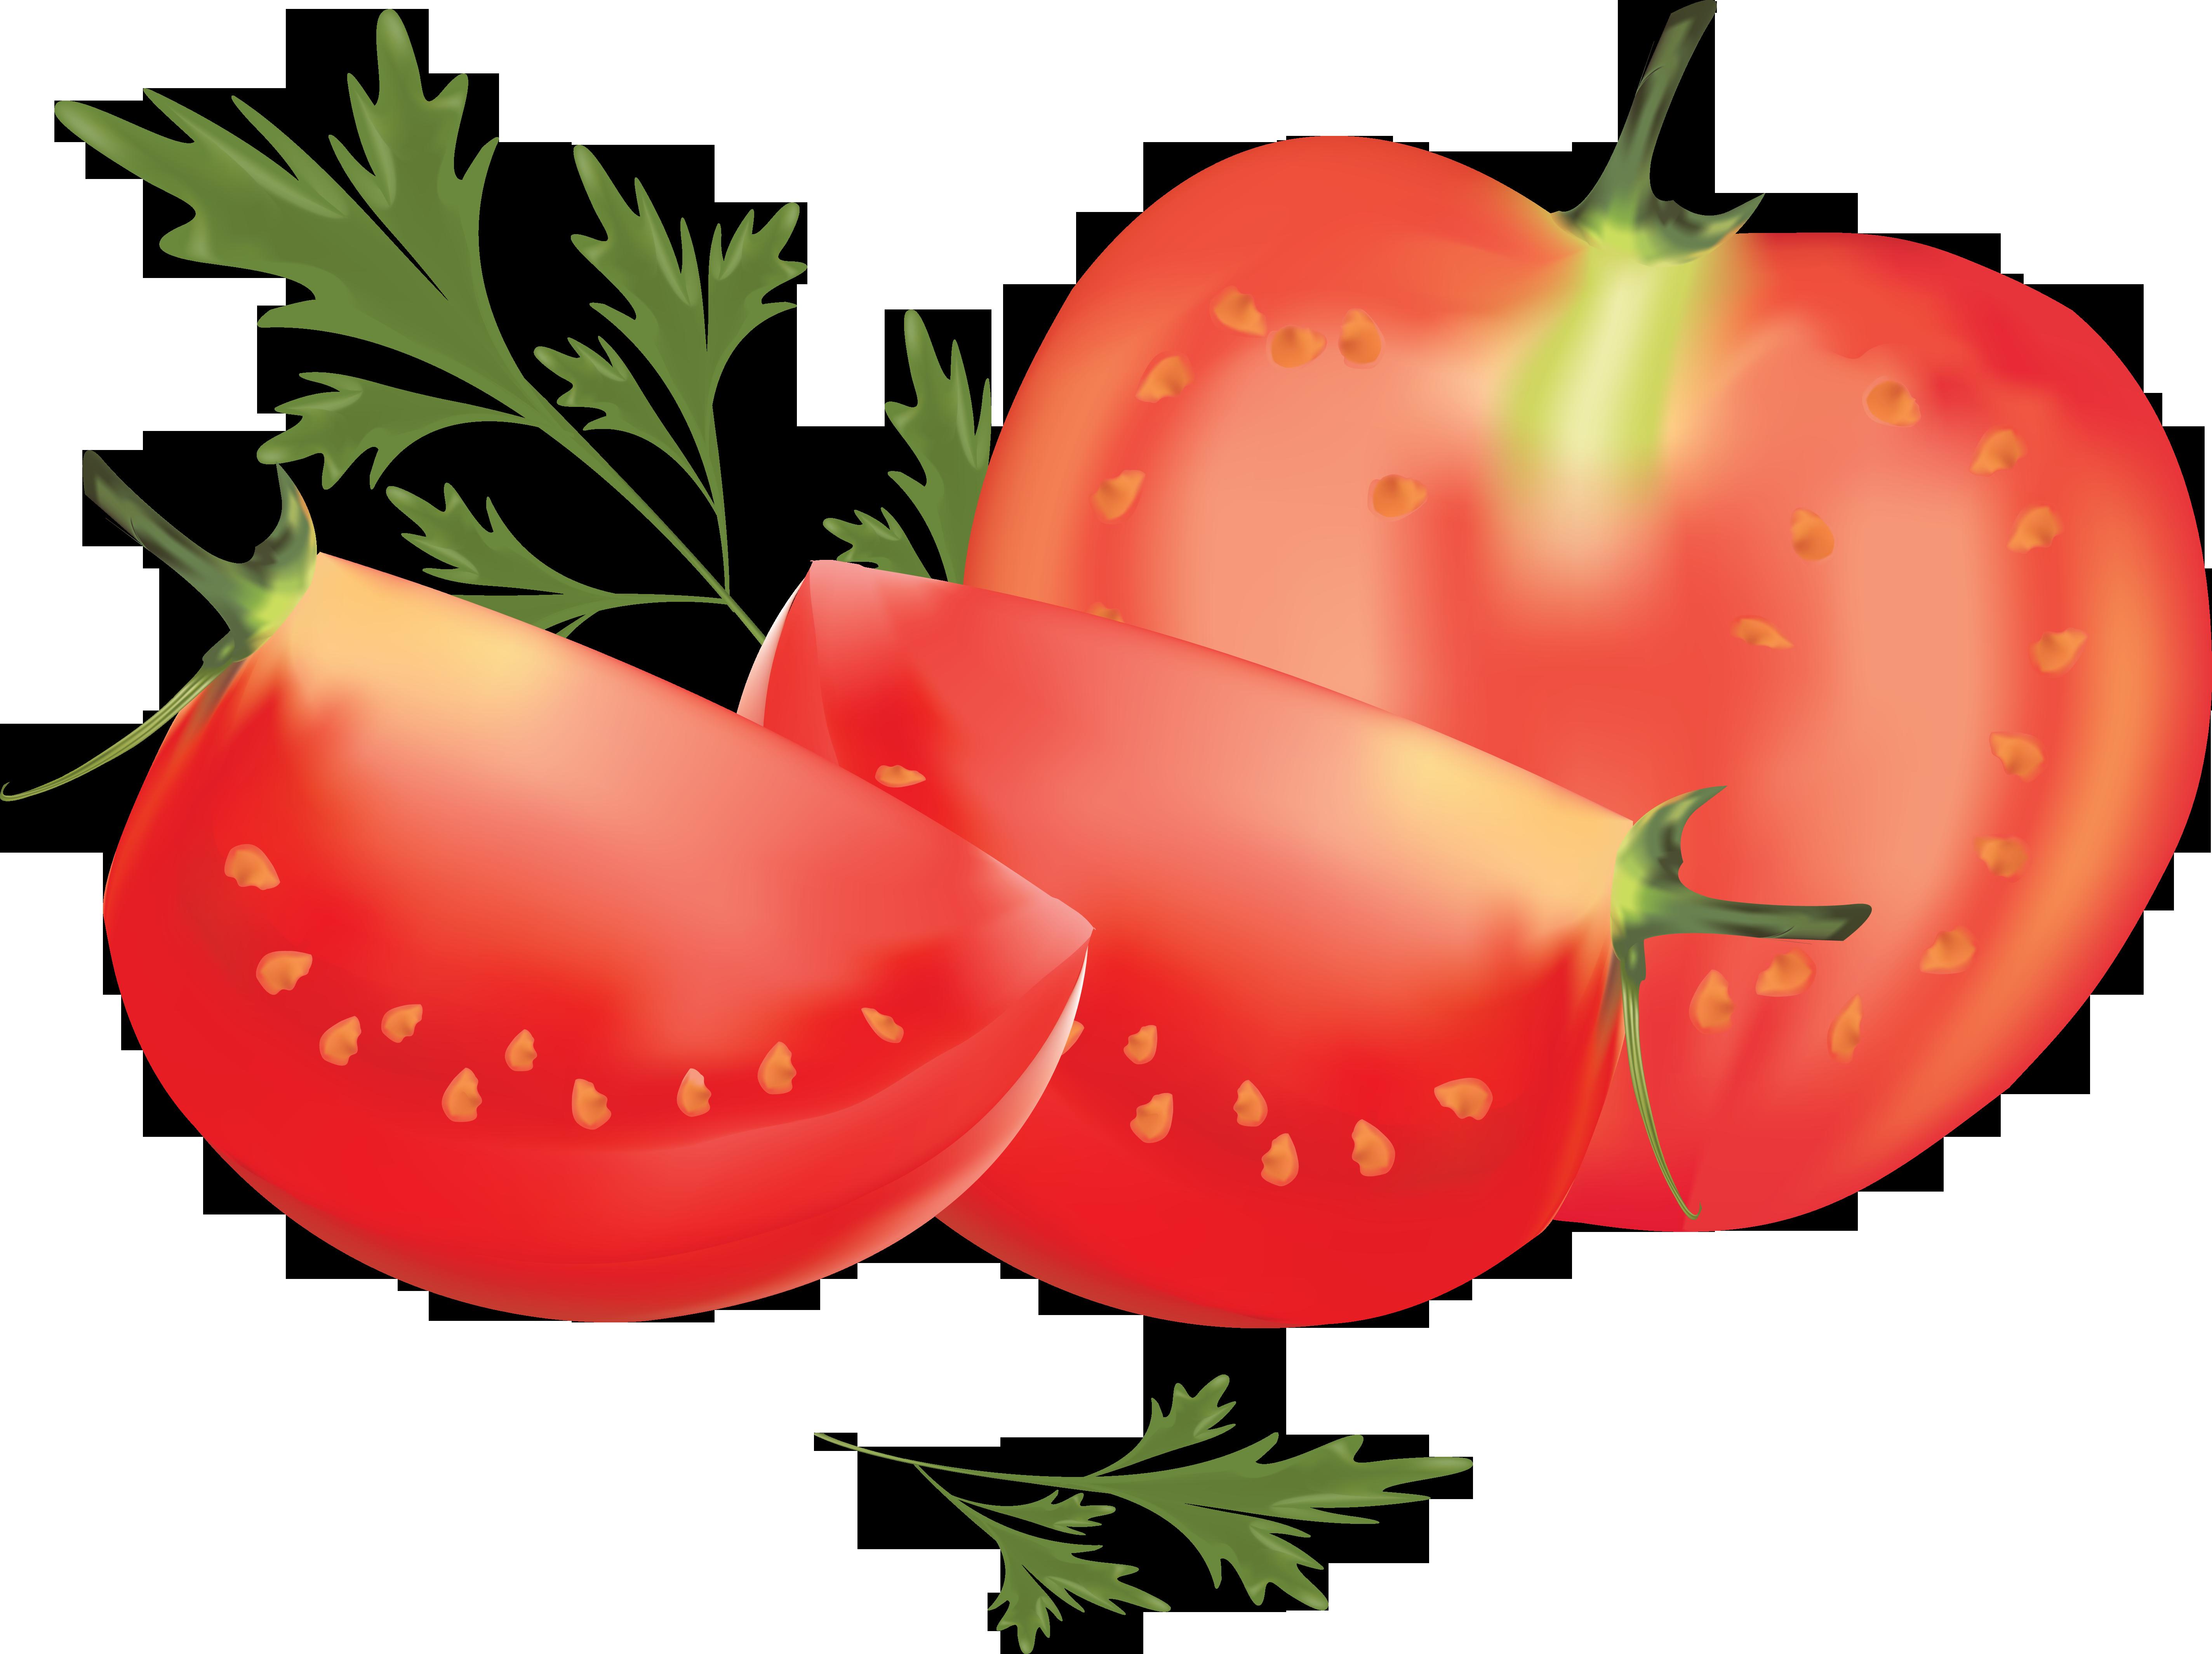 Нарезанный томат и петрушка